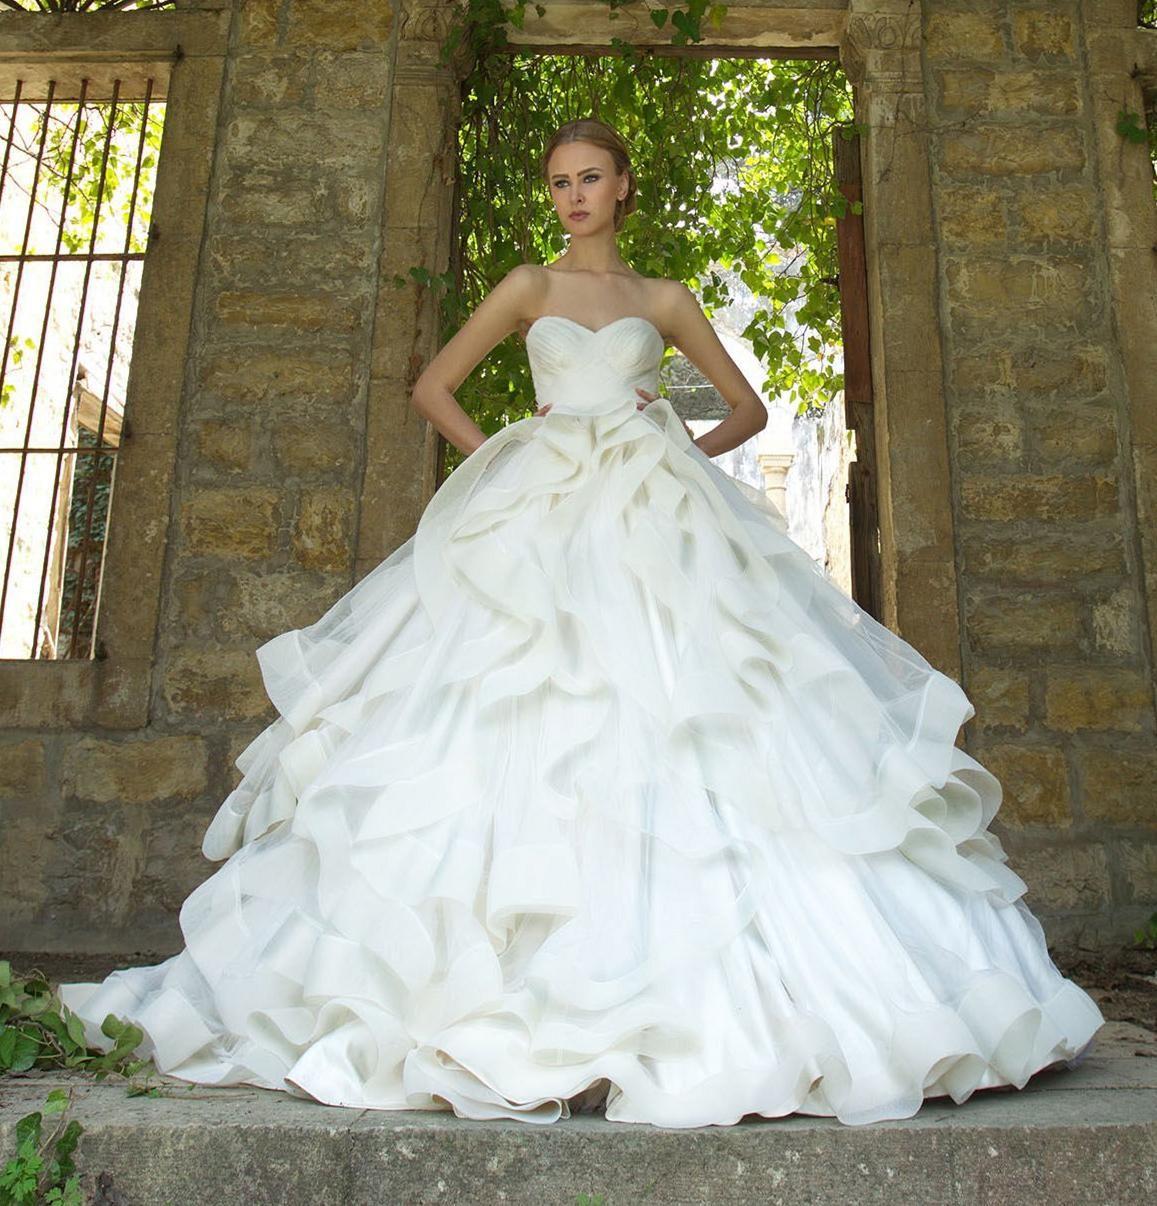 2017 Pnina Tornai Ball Gown Wedding Dresses High Quality